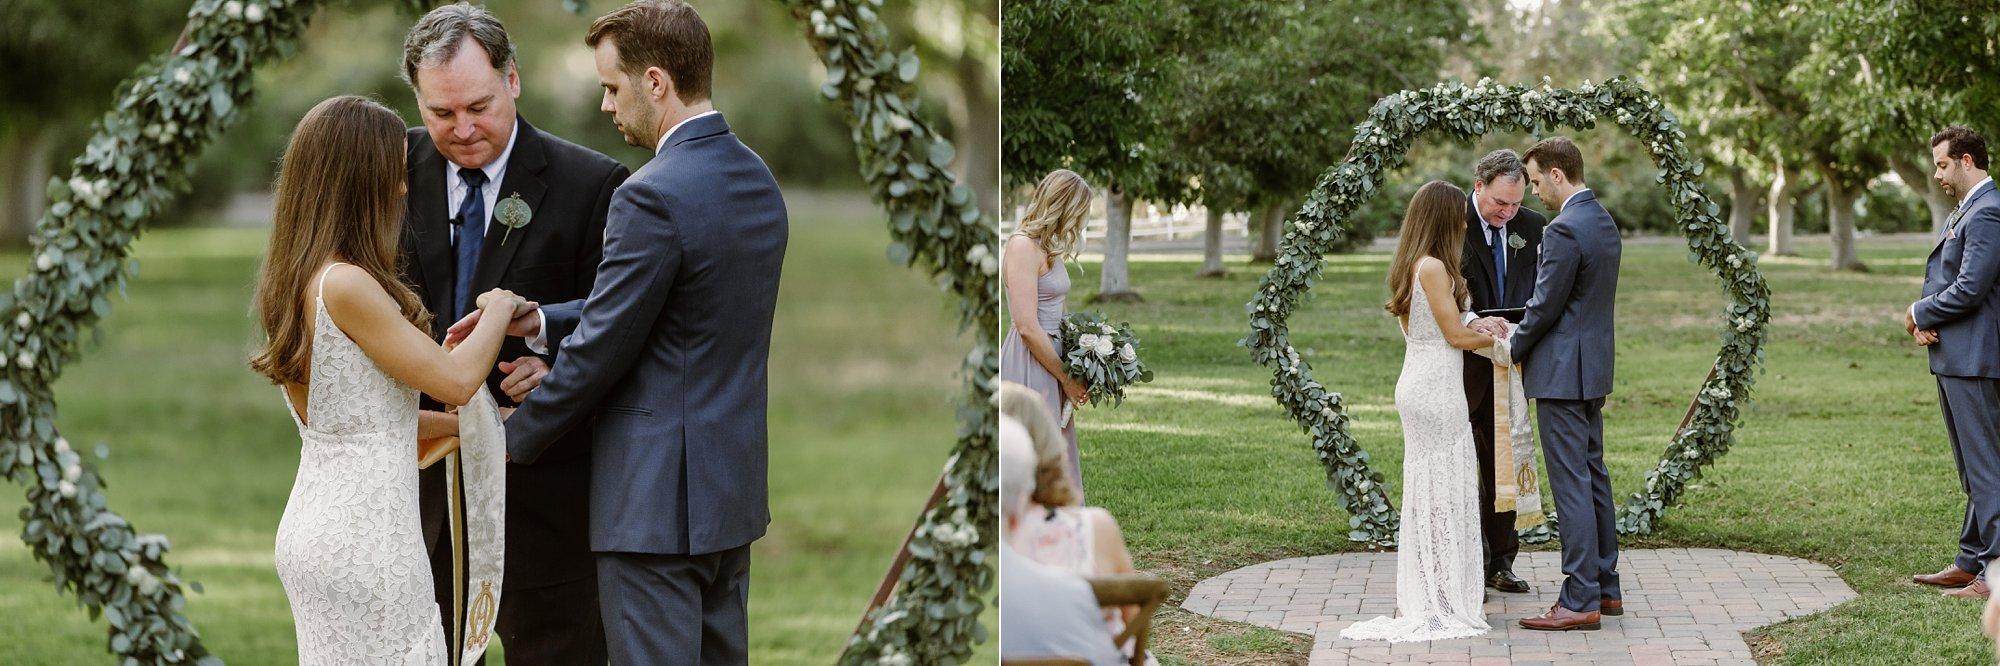 Walnut Grove Moorpark California Wedding_0042.jpg